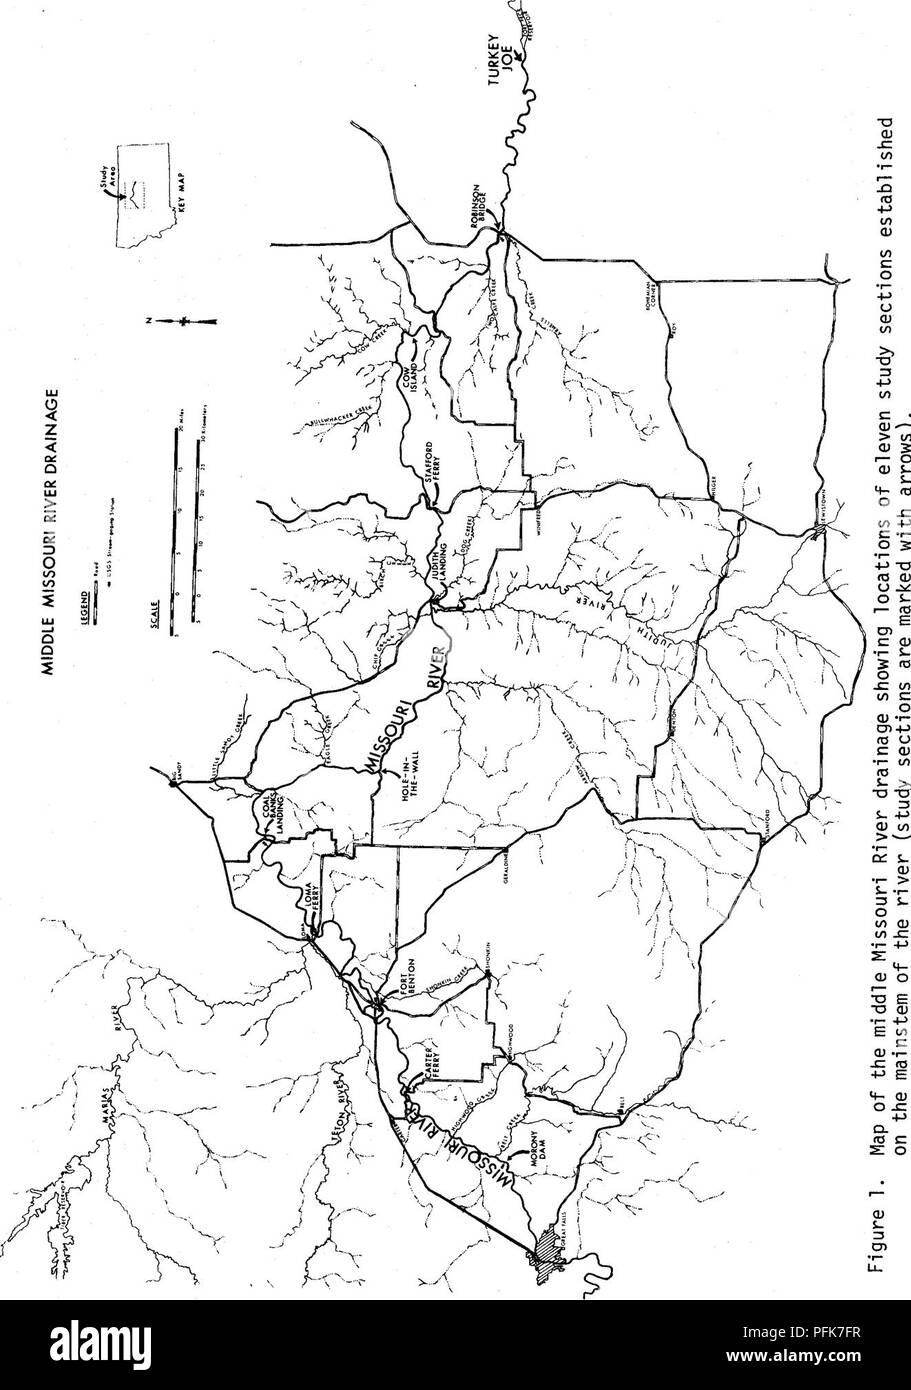 Fish Populations Of The Wild Scenic Missouri River Montana